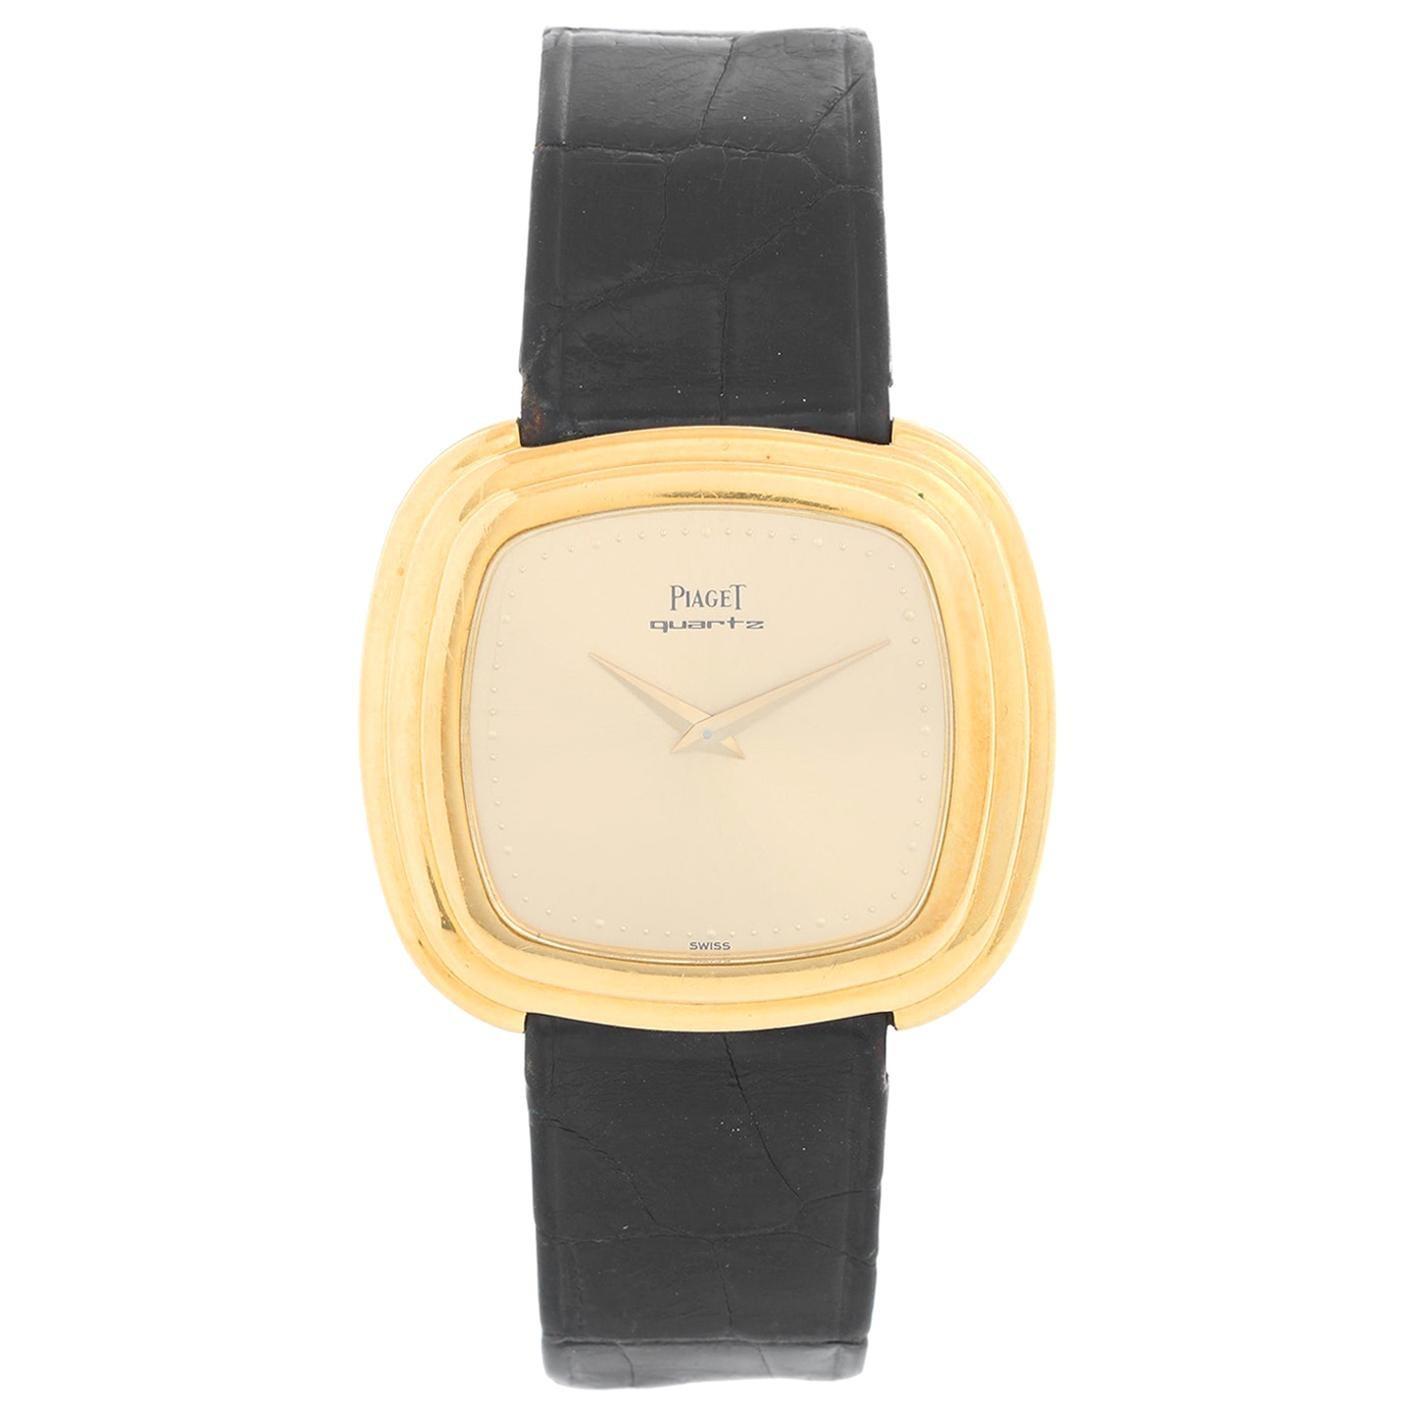 Piaget 18 Karat Yellow Gold Men's Quartz Watch